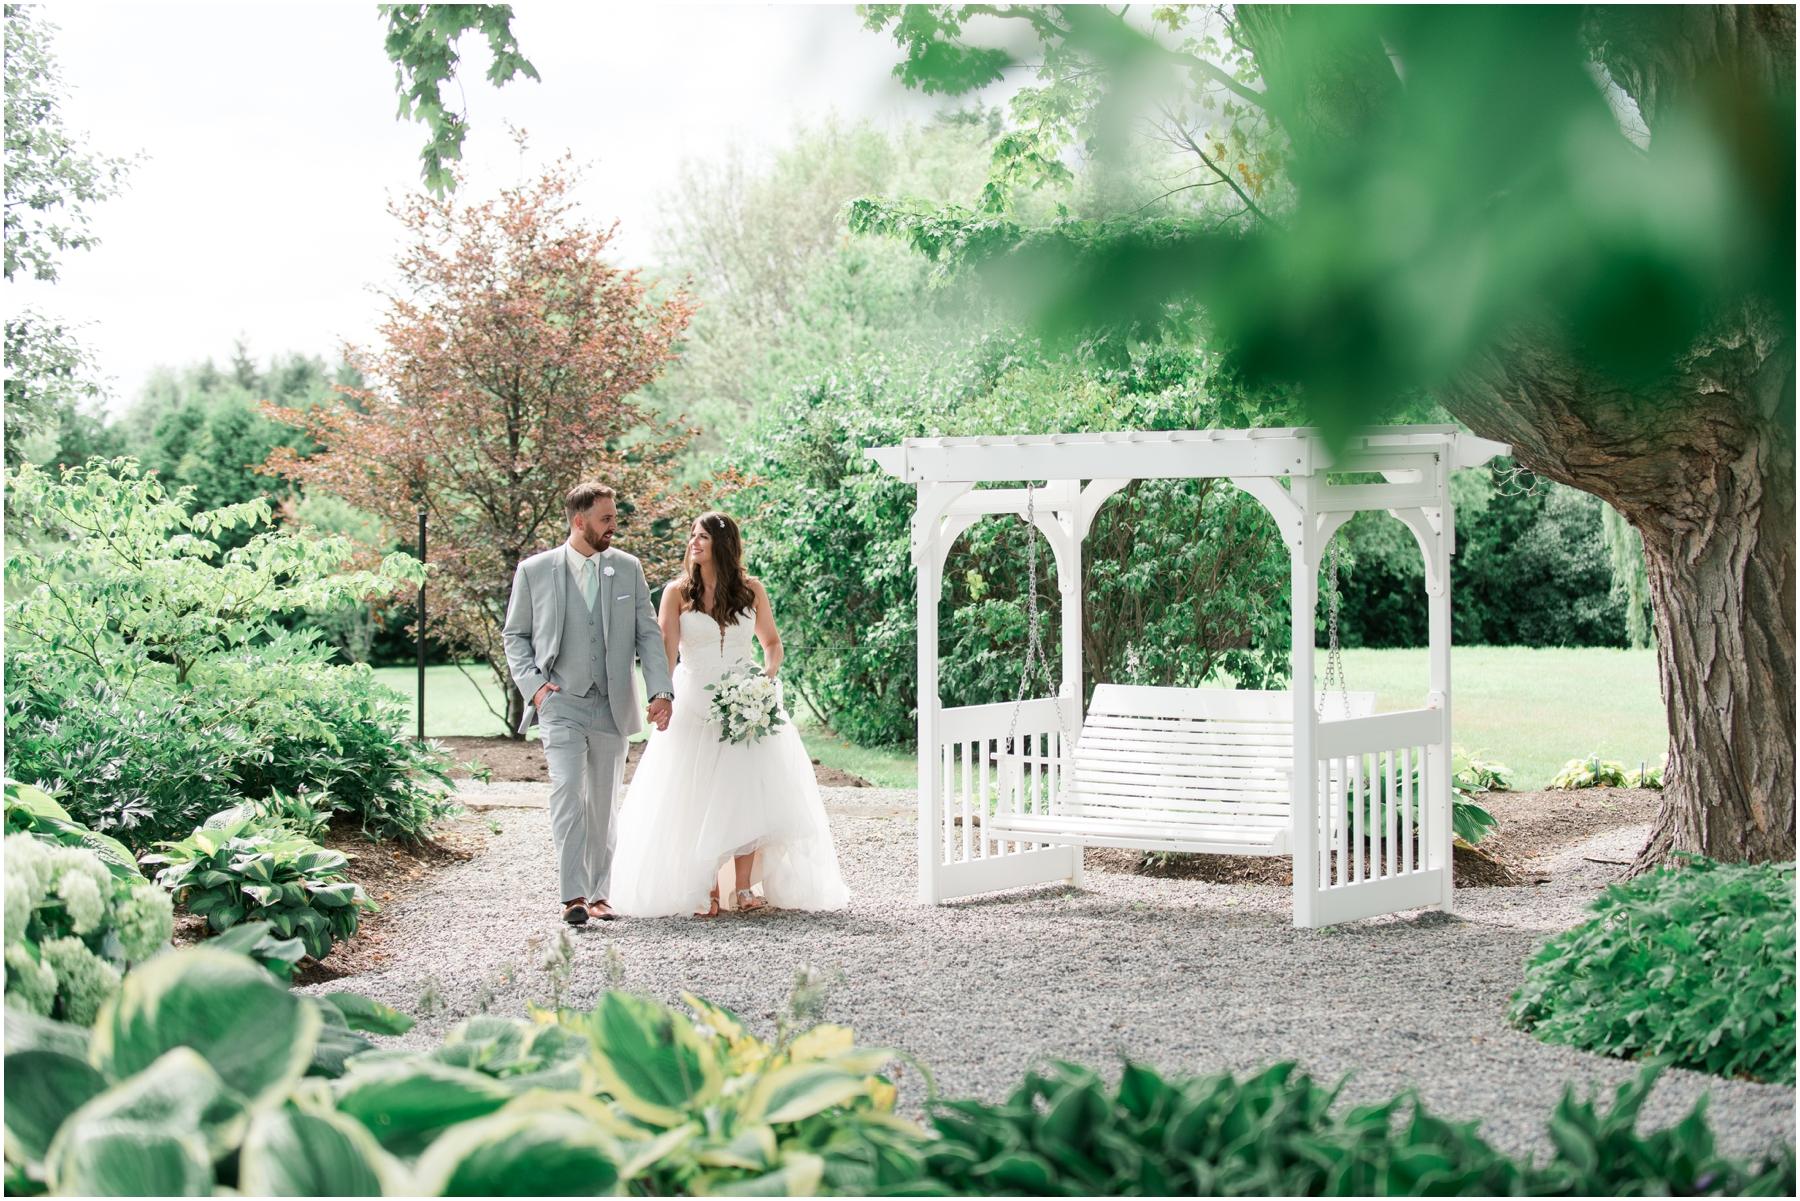 Bloom Field Gardens Wedding Precious Photography_0340